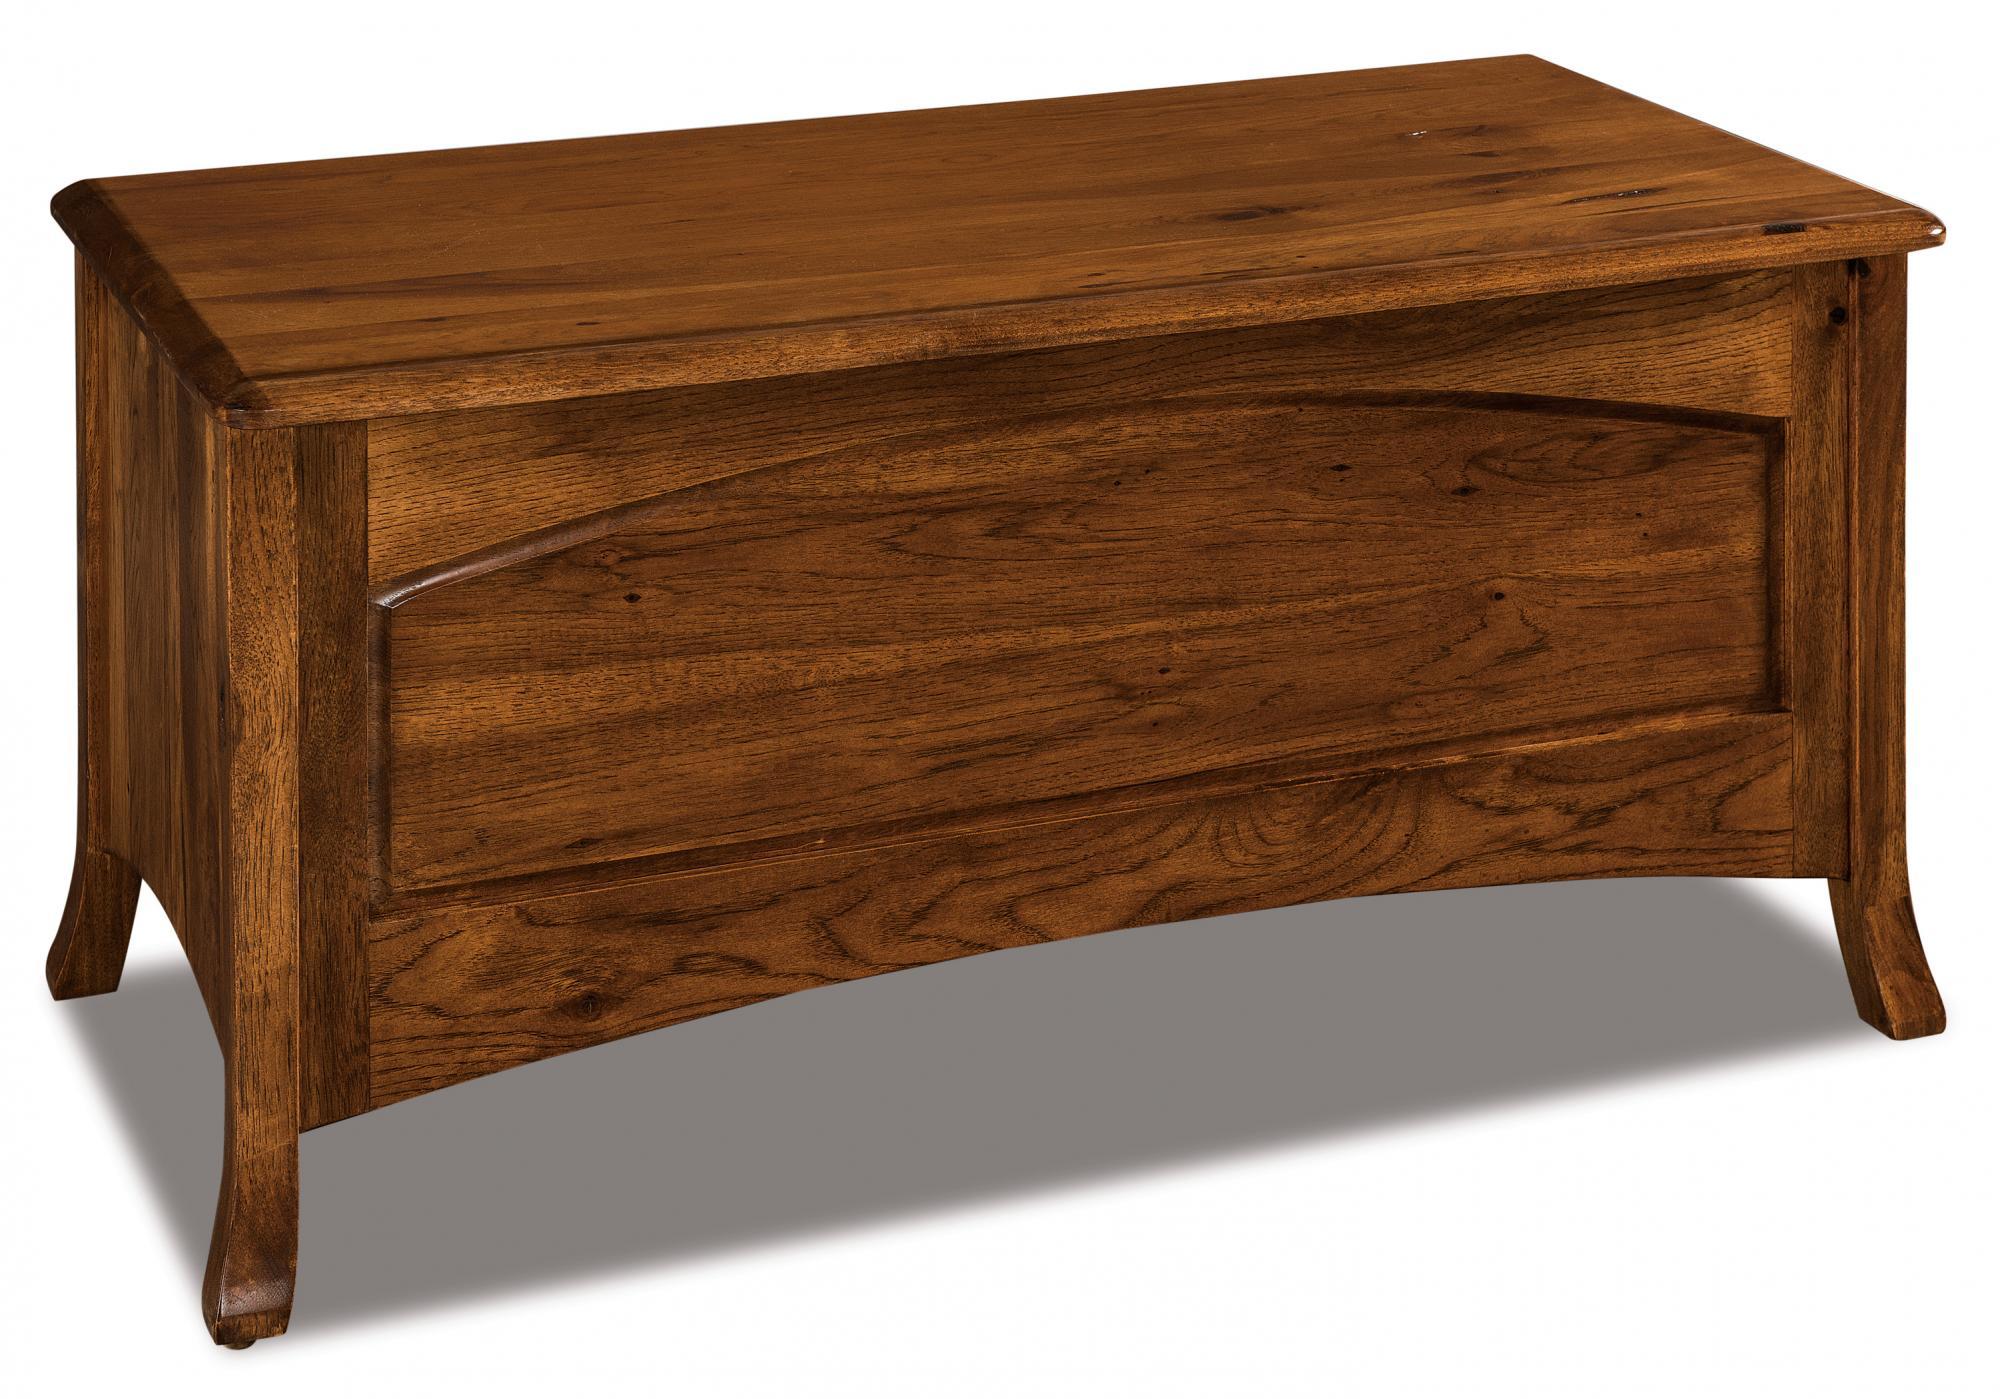 Carlisle Blanket Chest Amish Furniture Store Mankato Mn